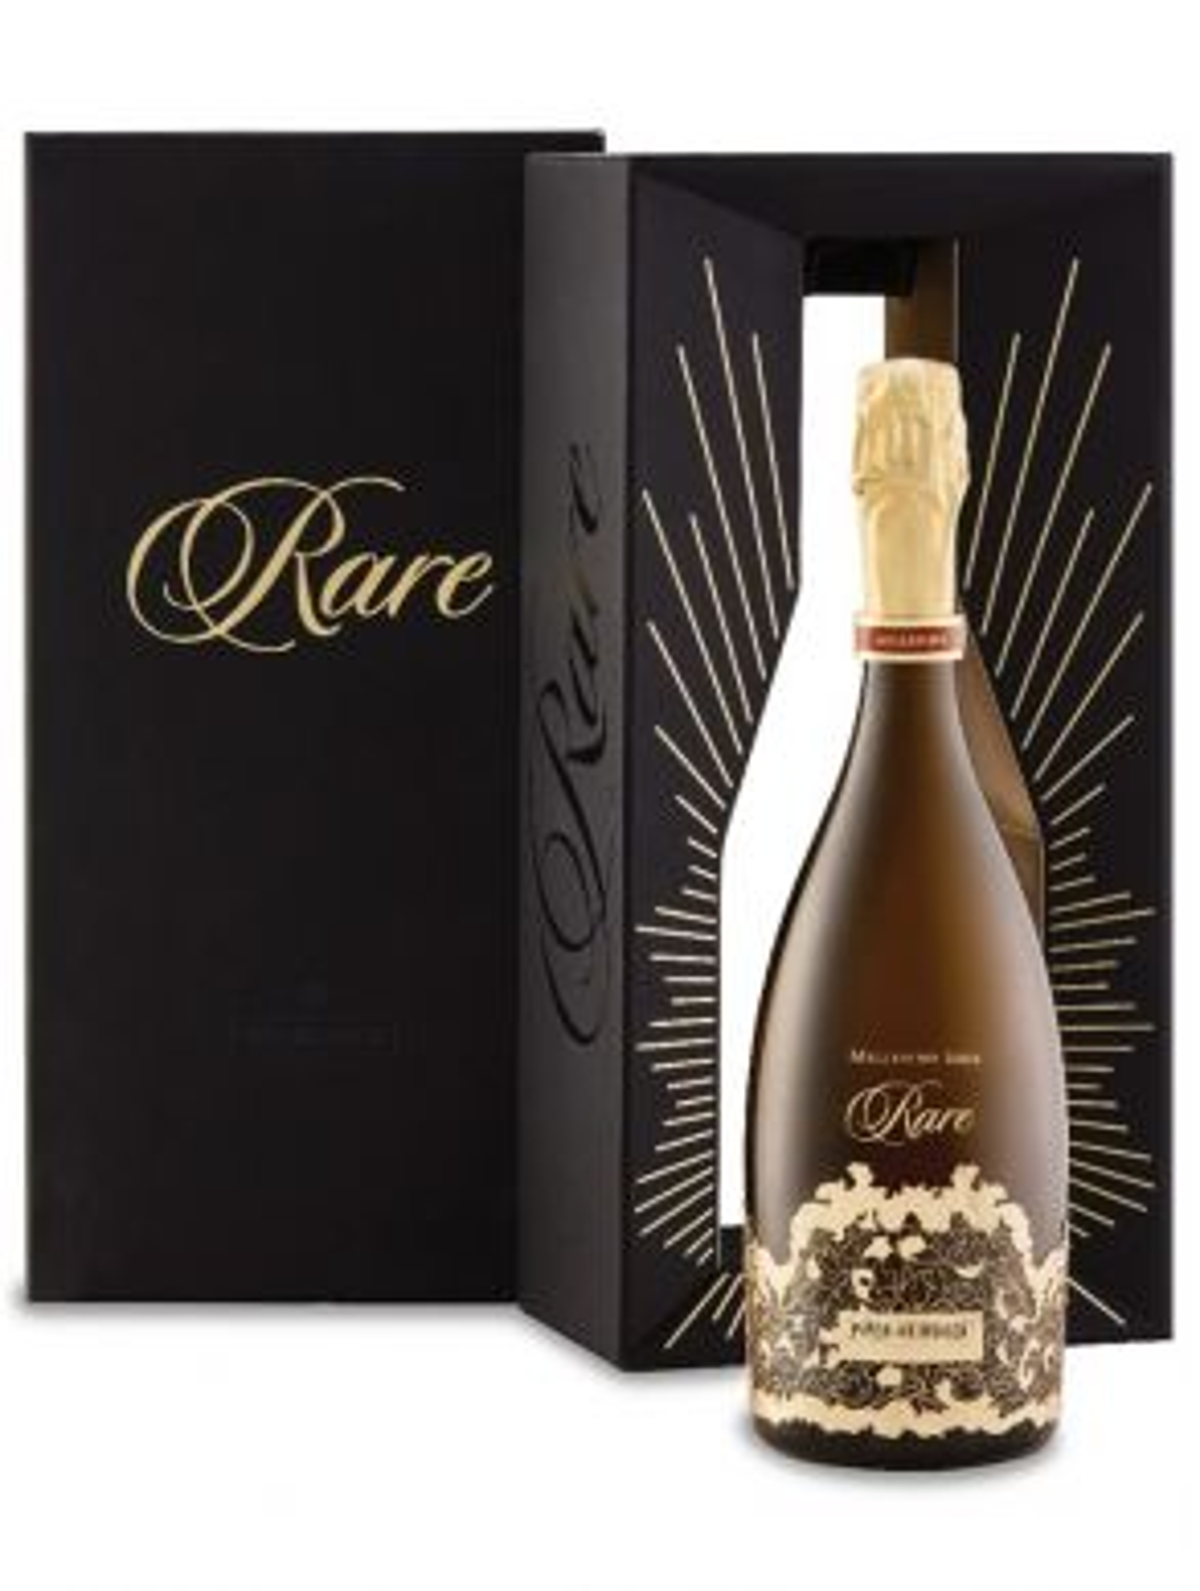 Piper Heidsieck Brut Rare 2002 Champagne 75cl Gift Box